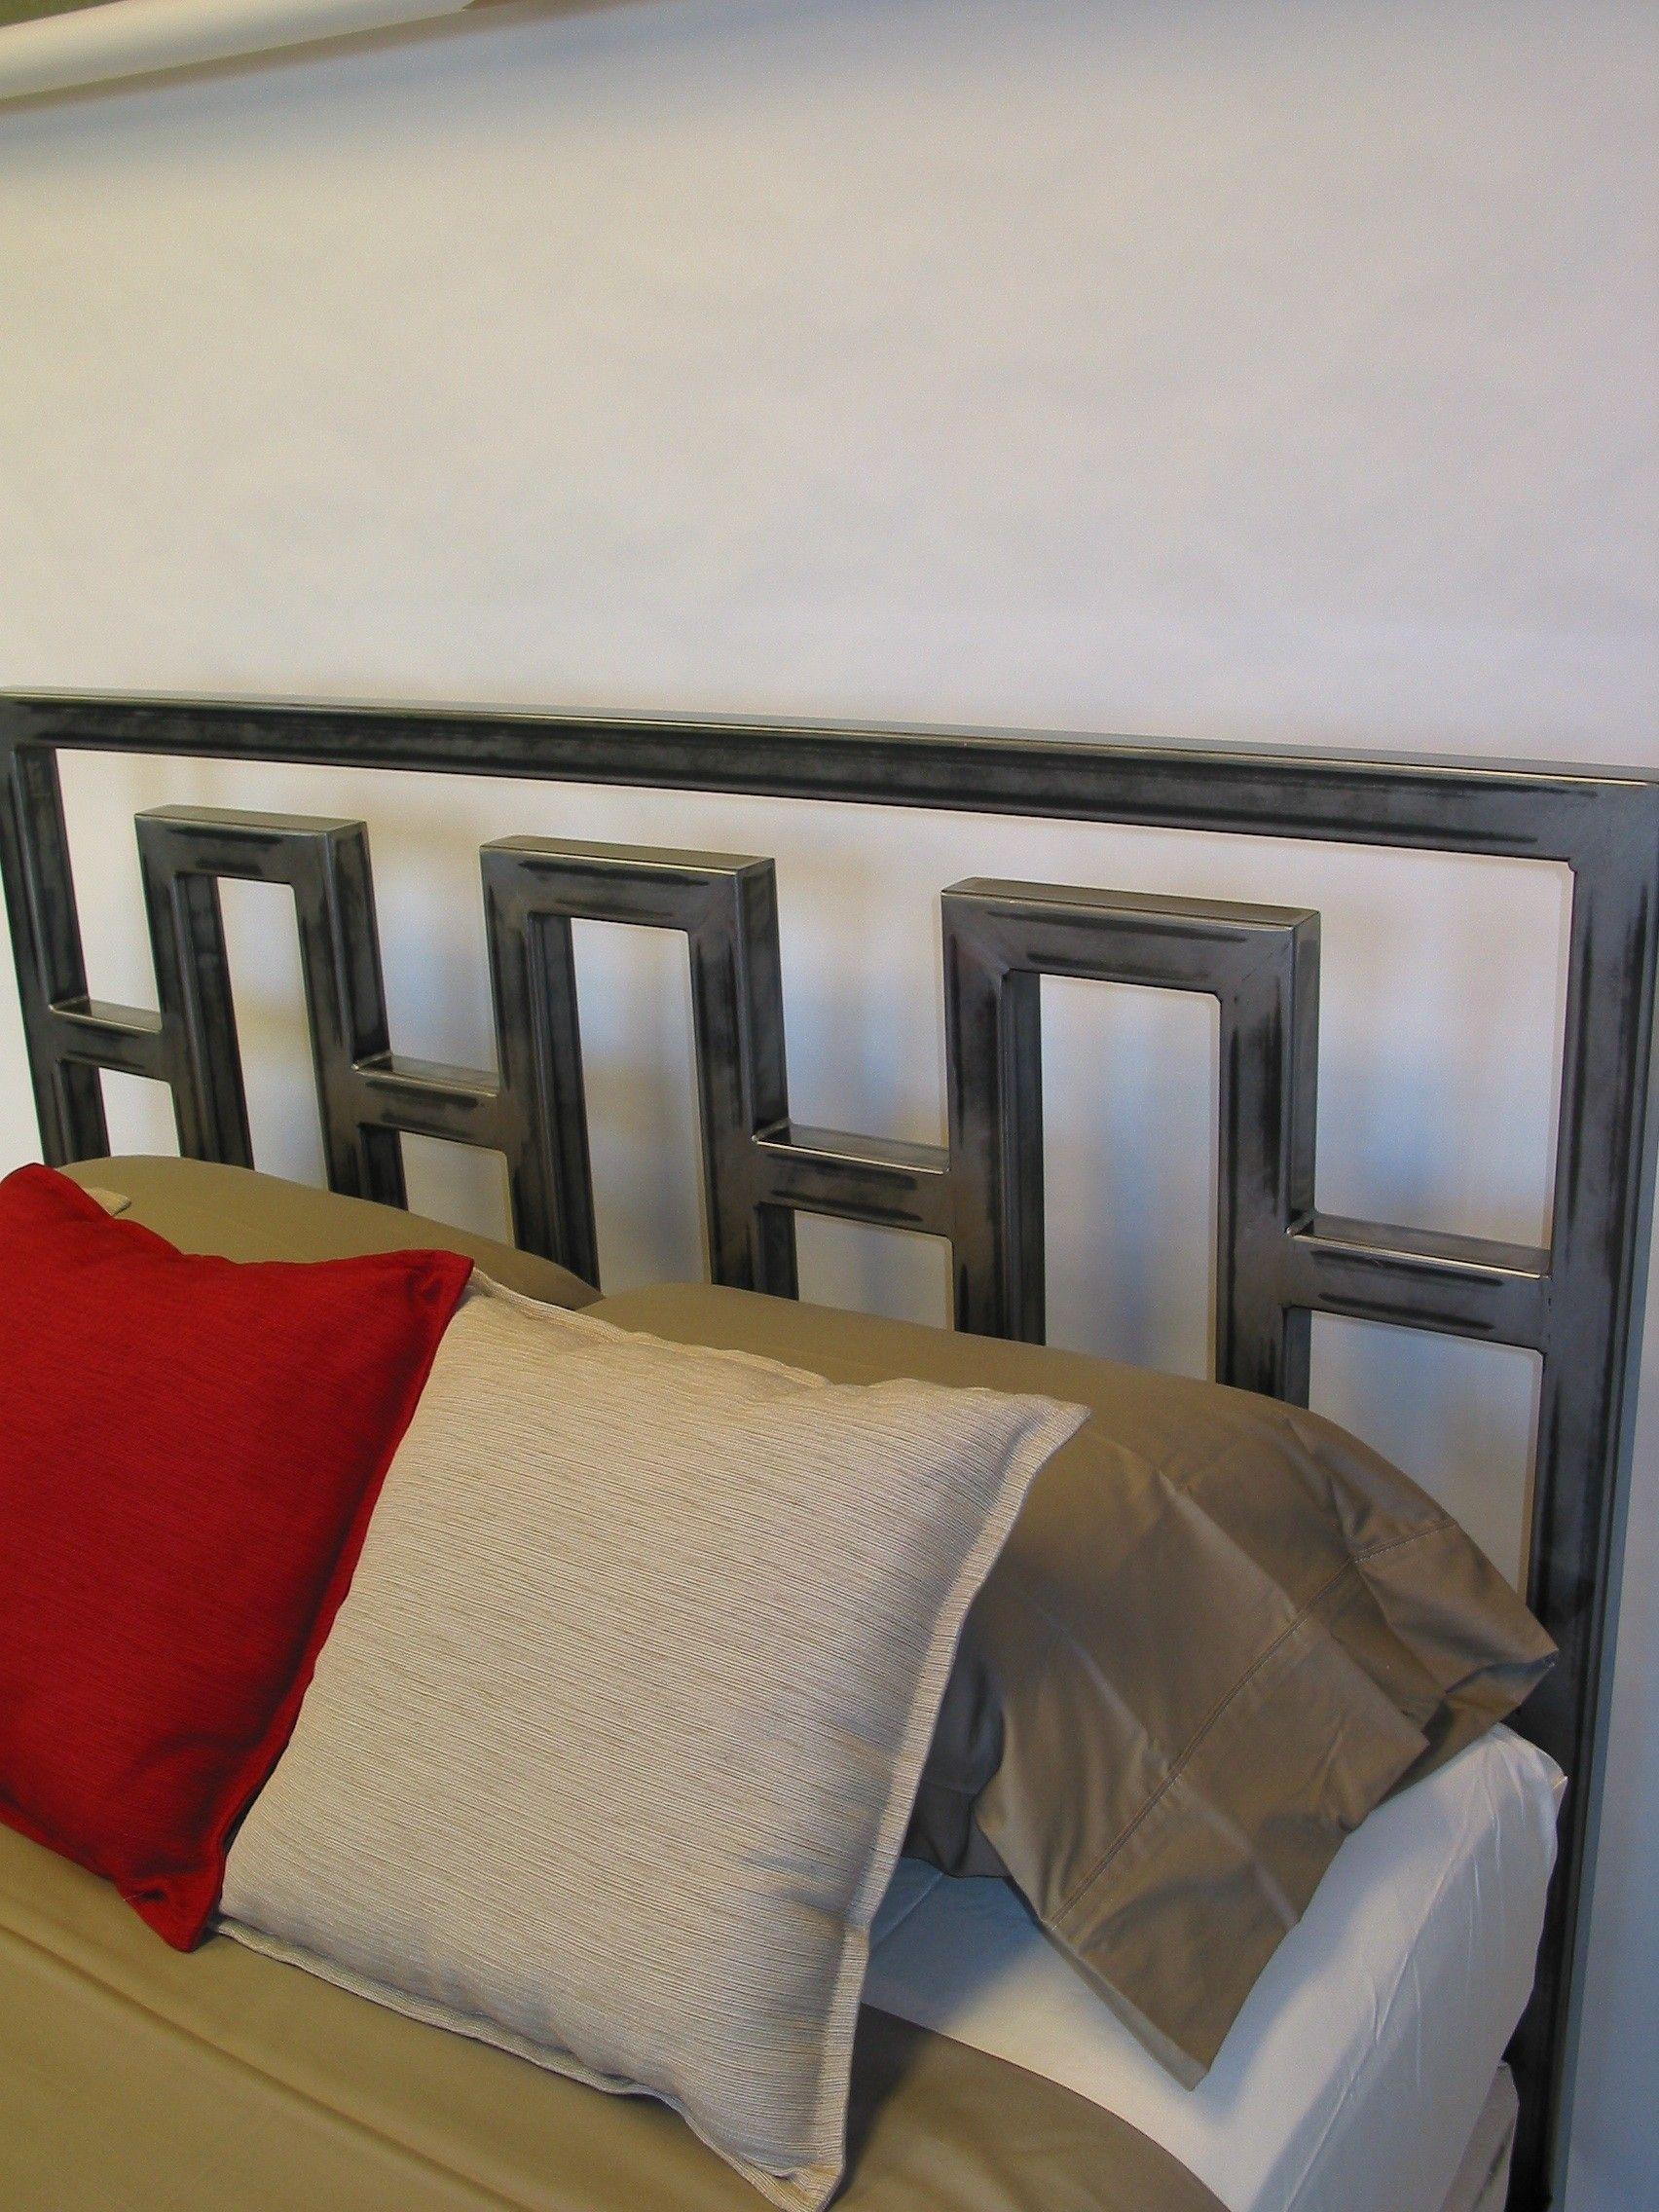 Architect Steel Bed Frame | Metal | Pinterest | Camas, Hierro y Herrería